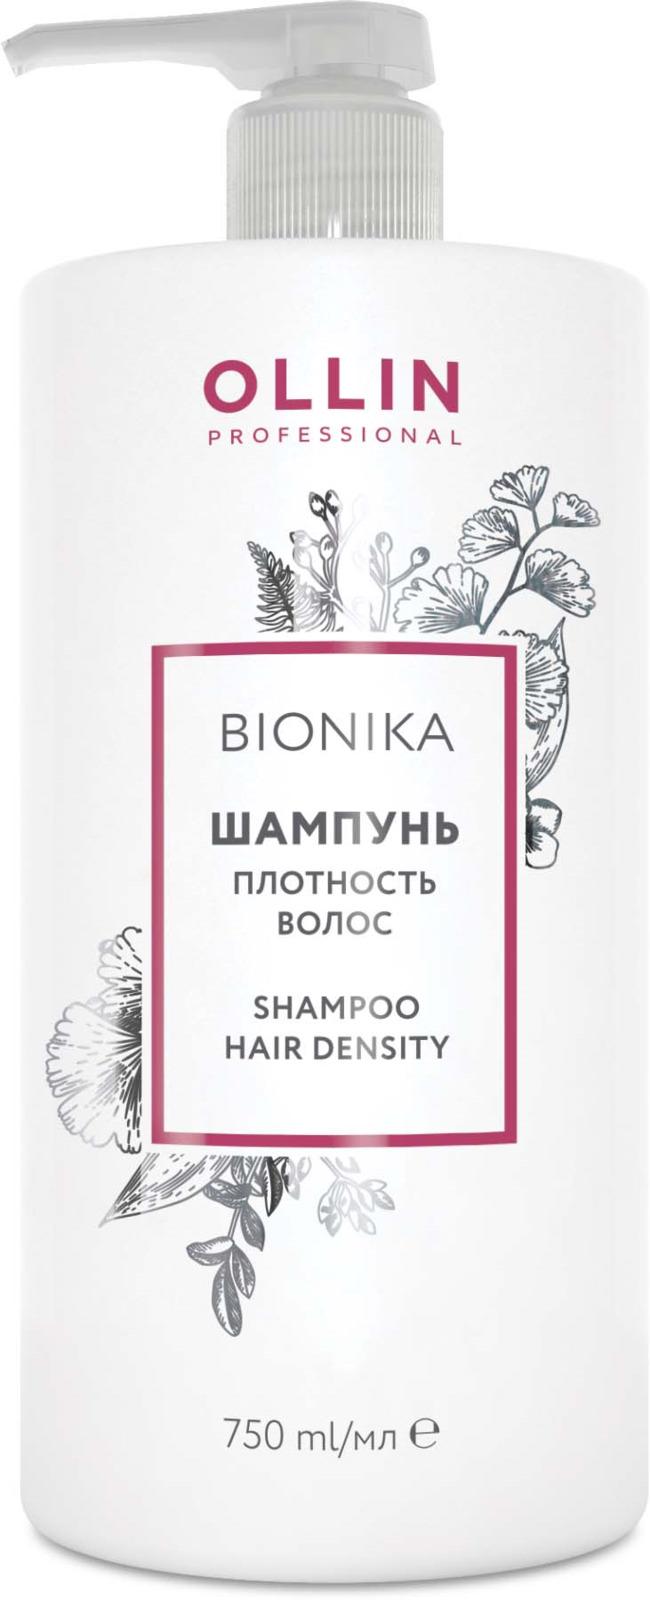 OLLIN Шампунь Плотность волос BioNika 750 мл